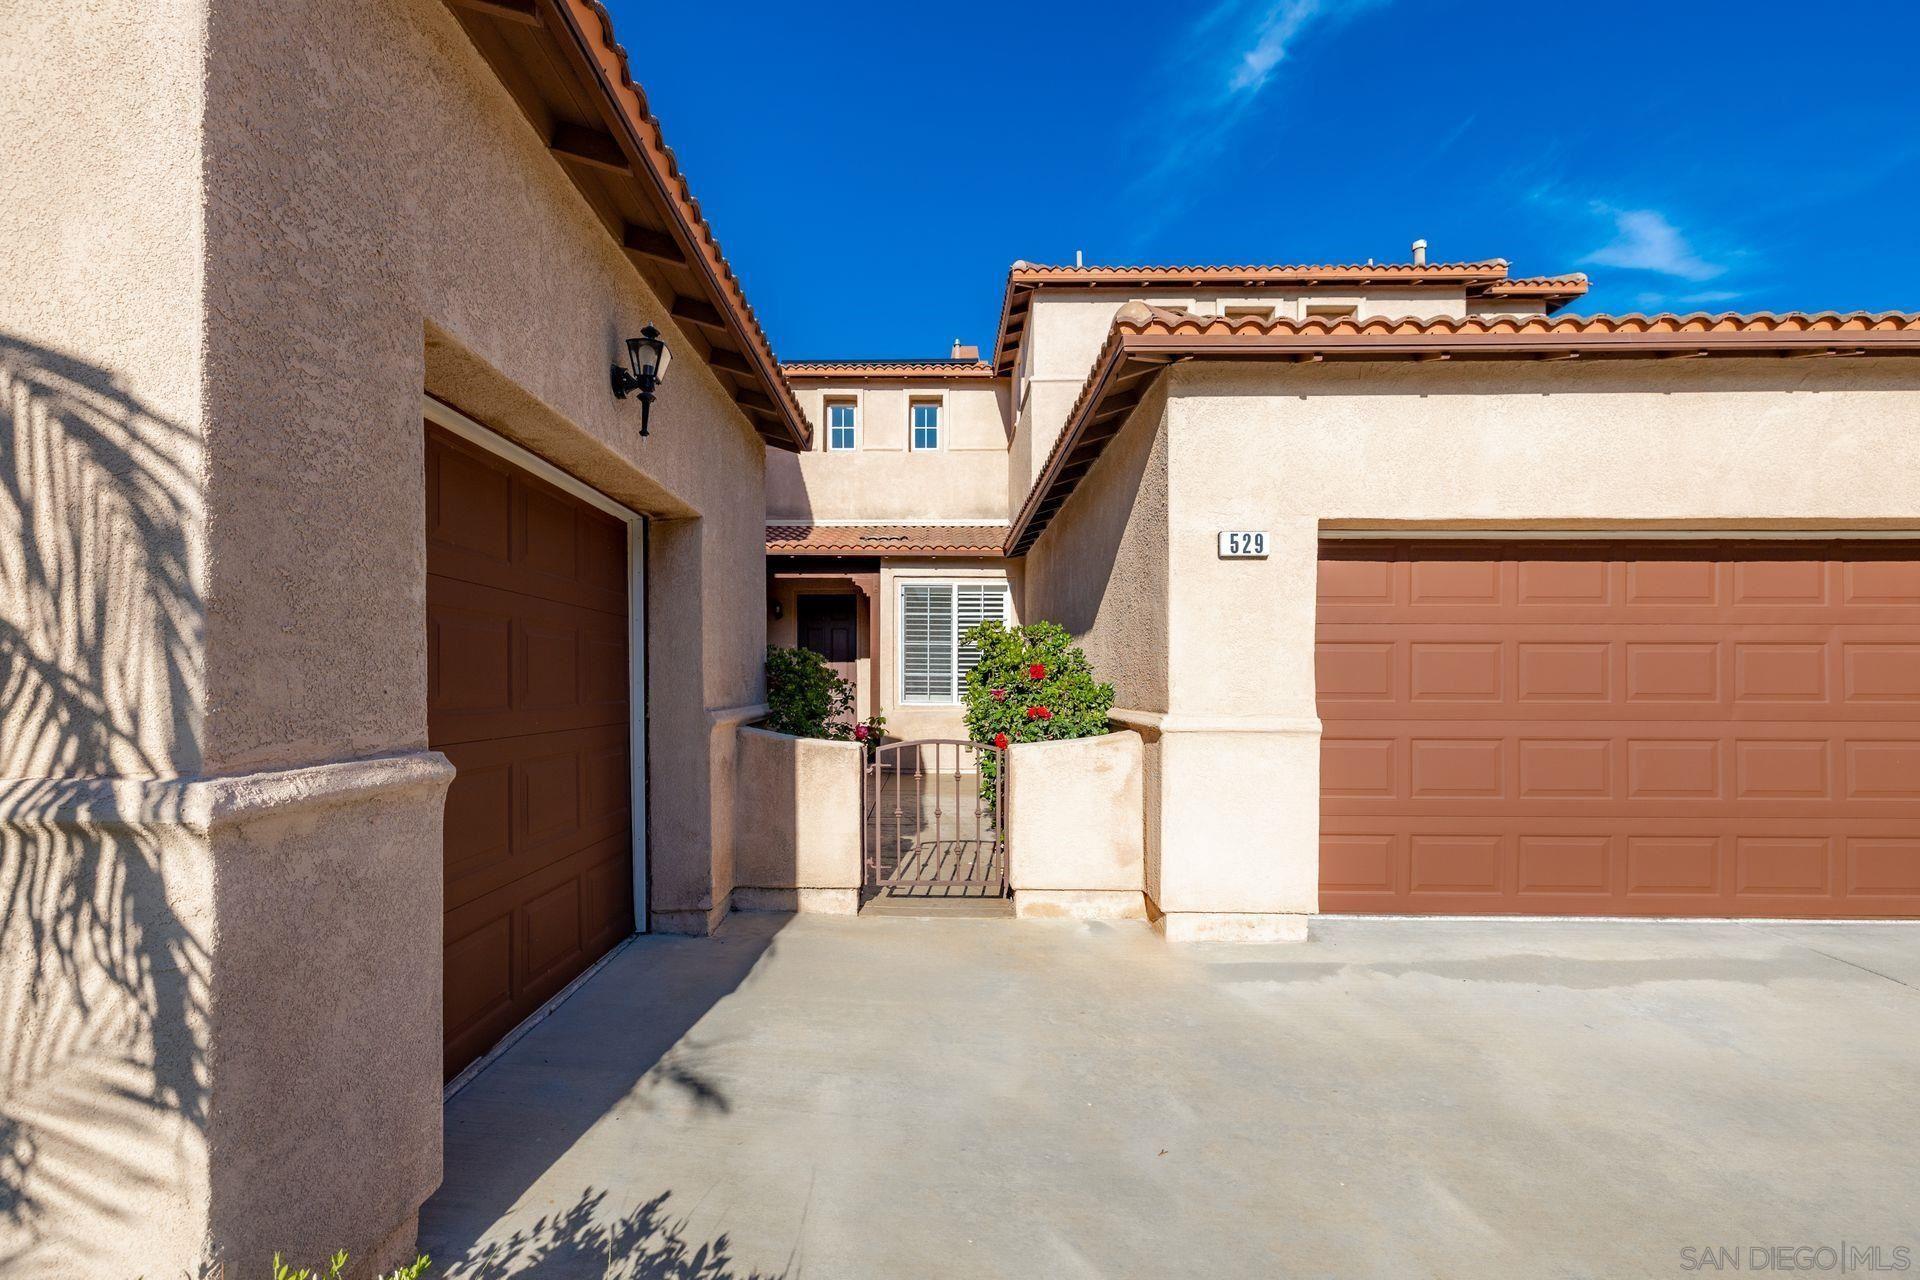 Photo of 529 Echo Ln, San Marcos, CA 92078 (MLS # 210021732)